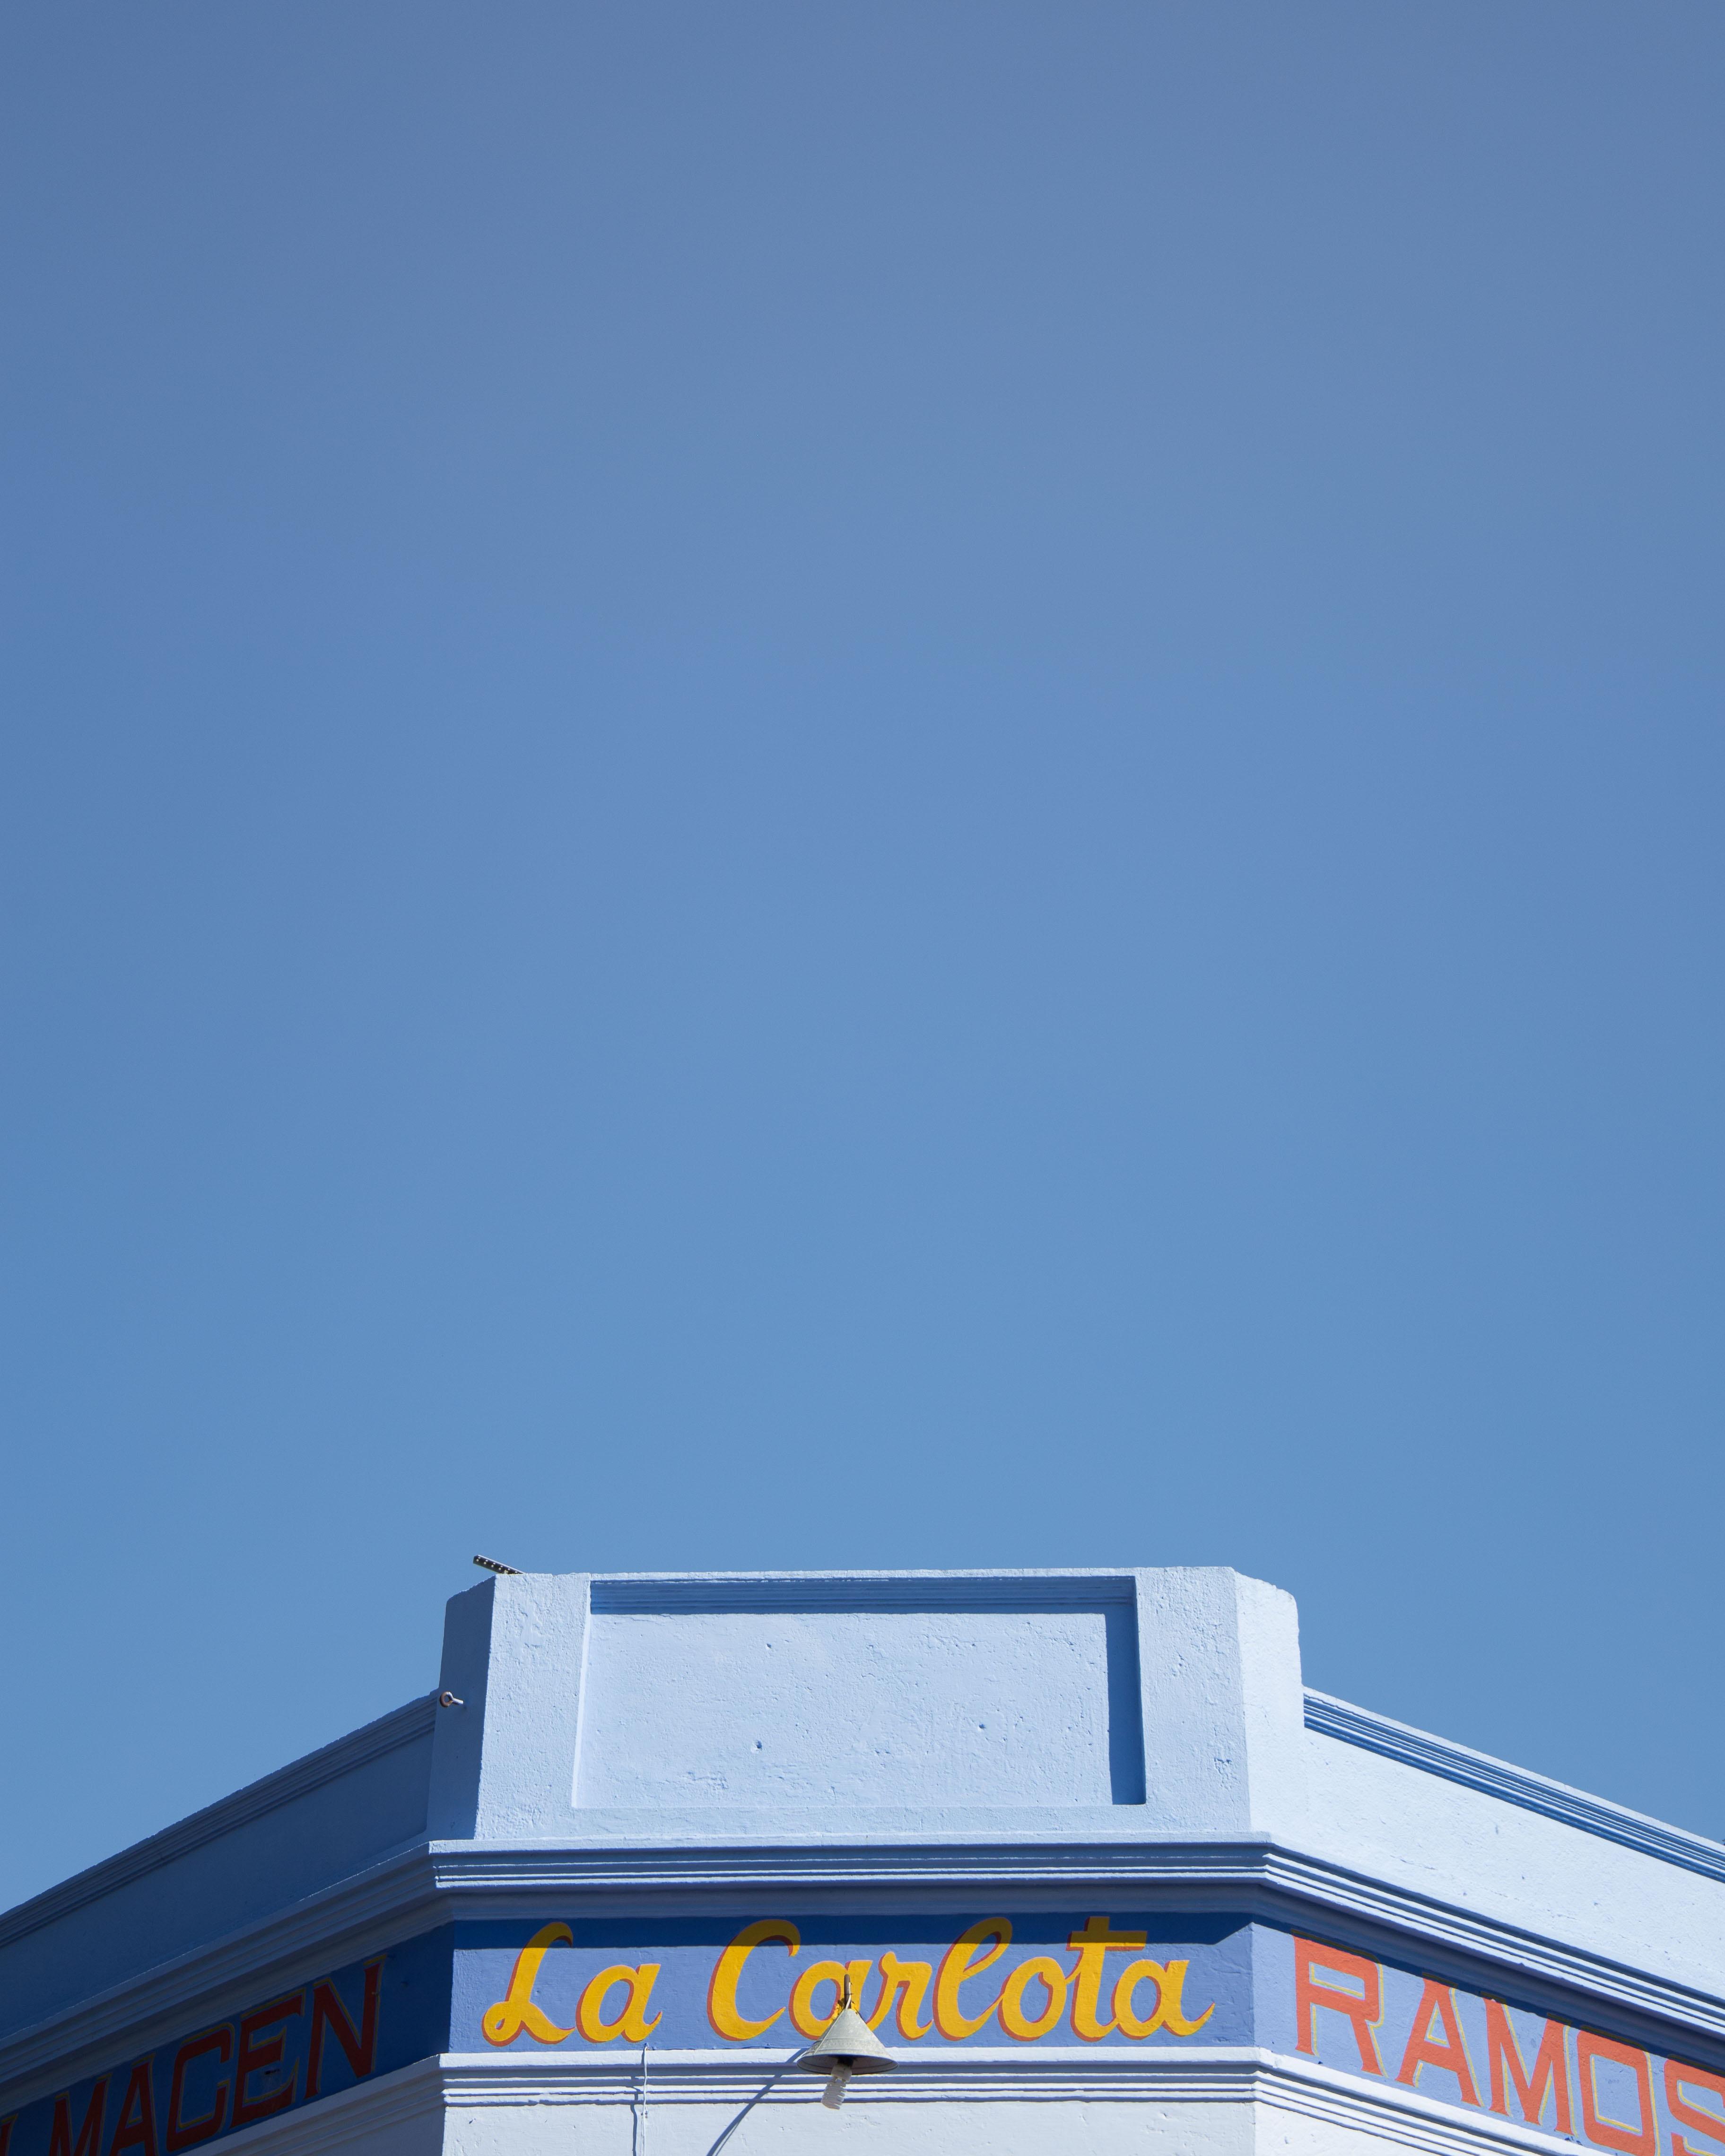 La Carlota building under blue sky during daytime